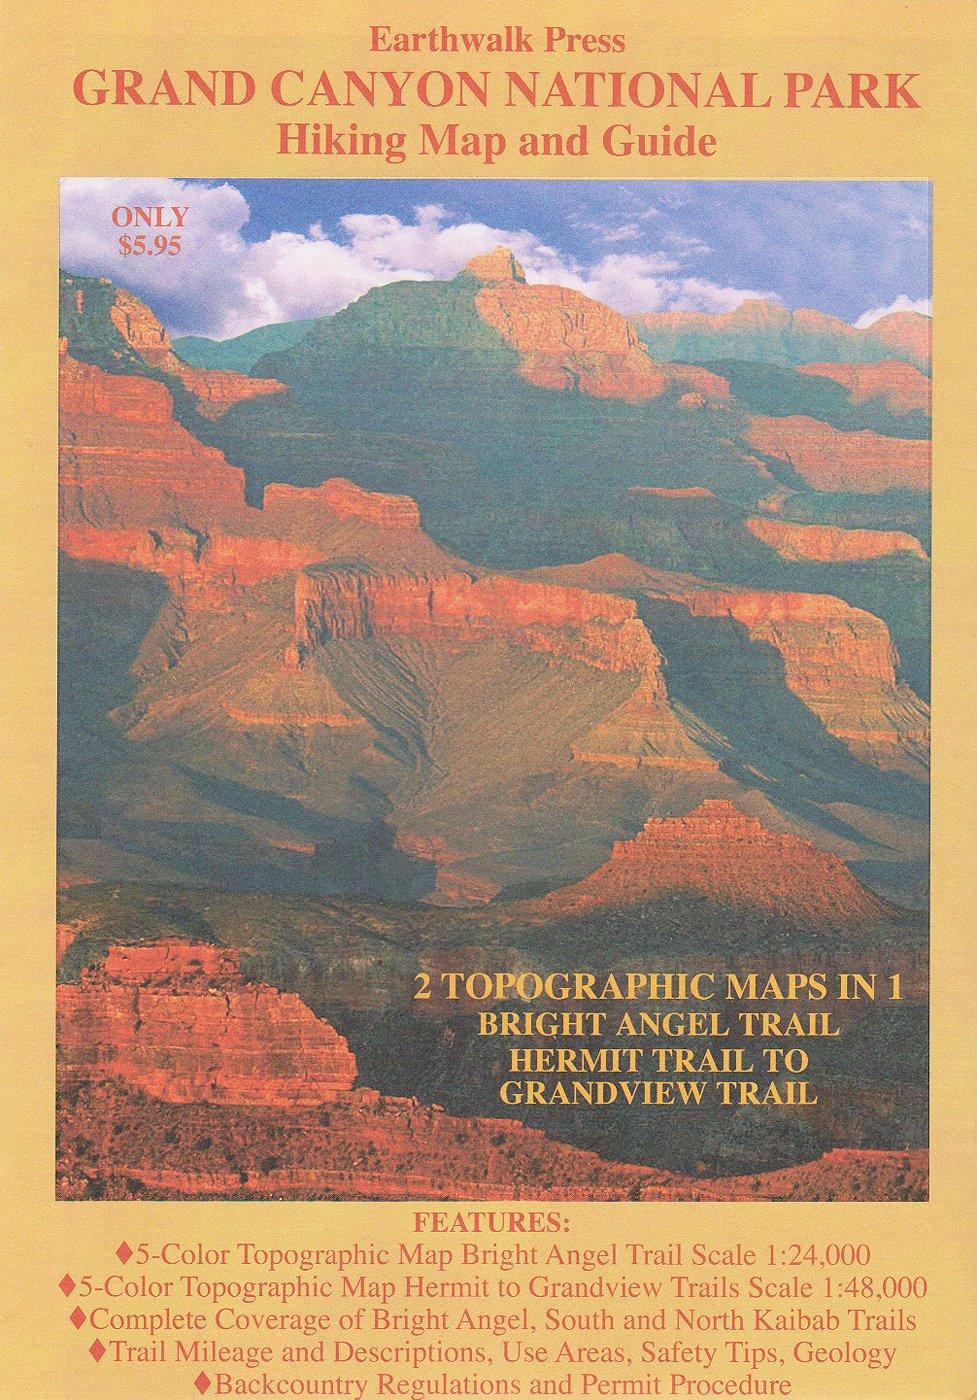 Grand Canyon National Park Map Guide Leo Larson Helen